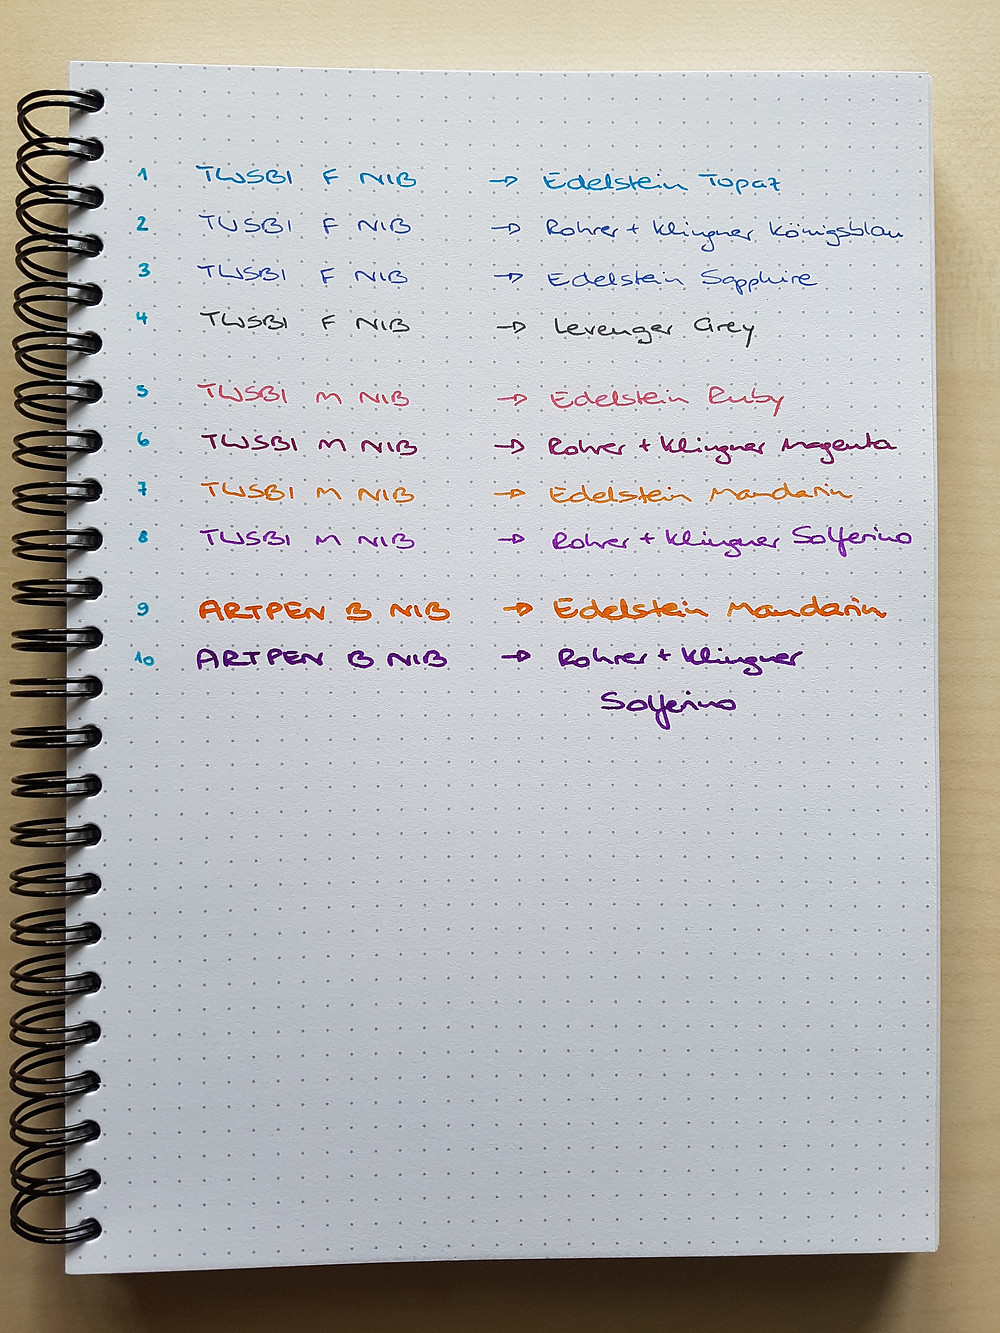 StickersSwissMade - blogpost - paper and pen test nbr 4 -  dotgrid.co notebooks_8